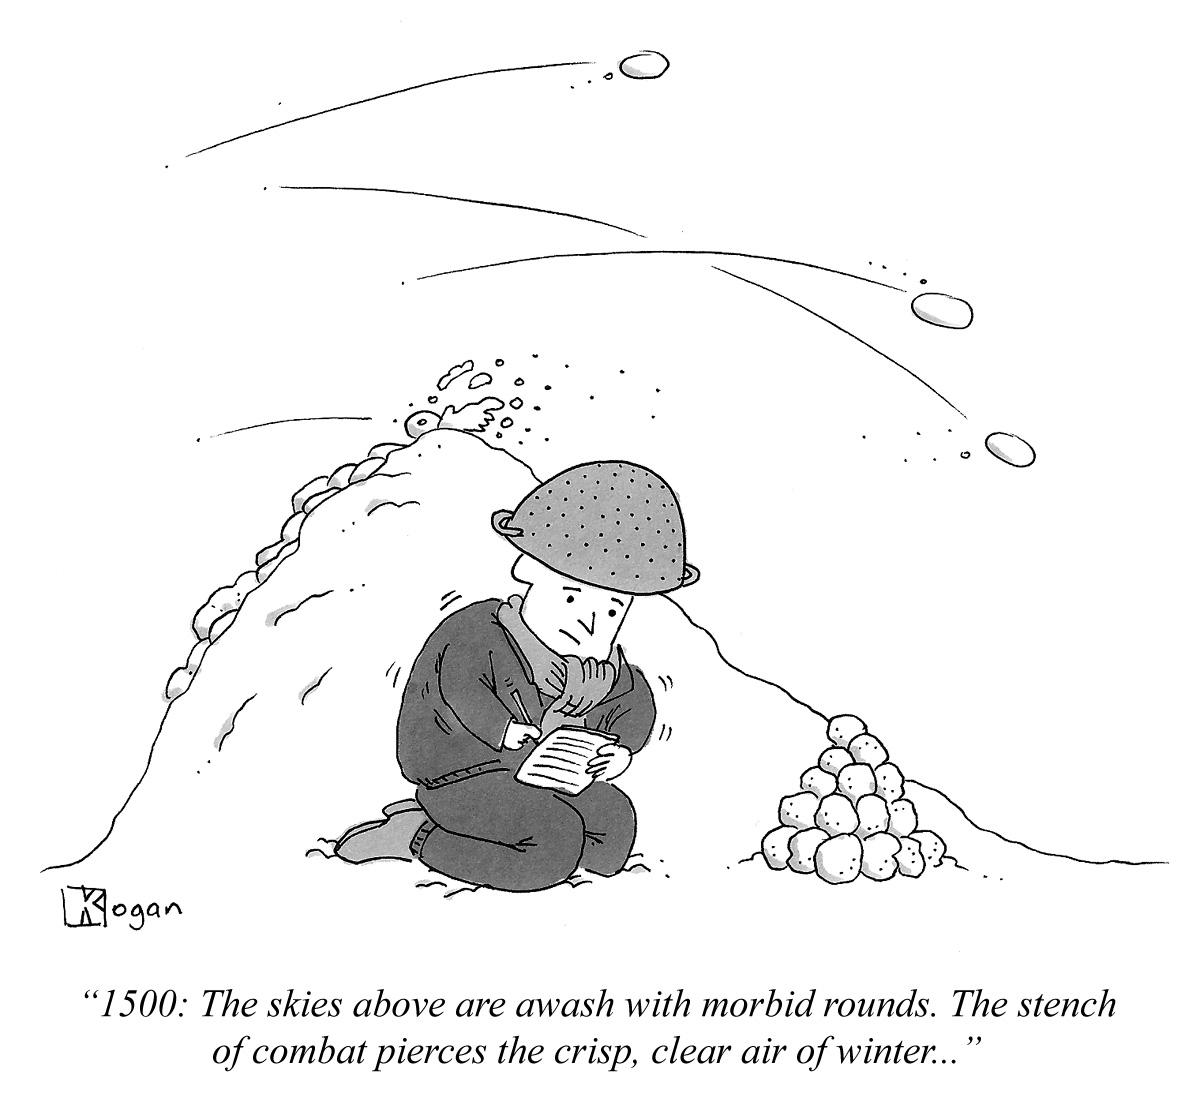 Cartoon about journaling.